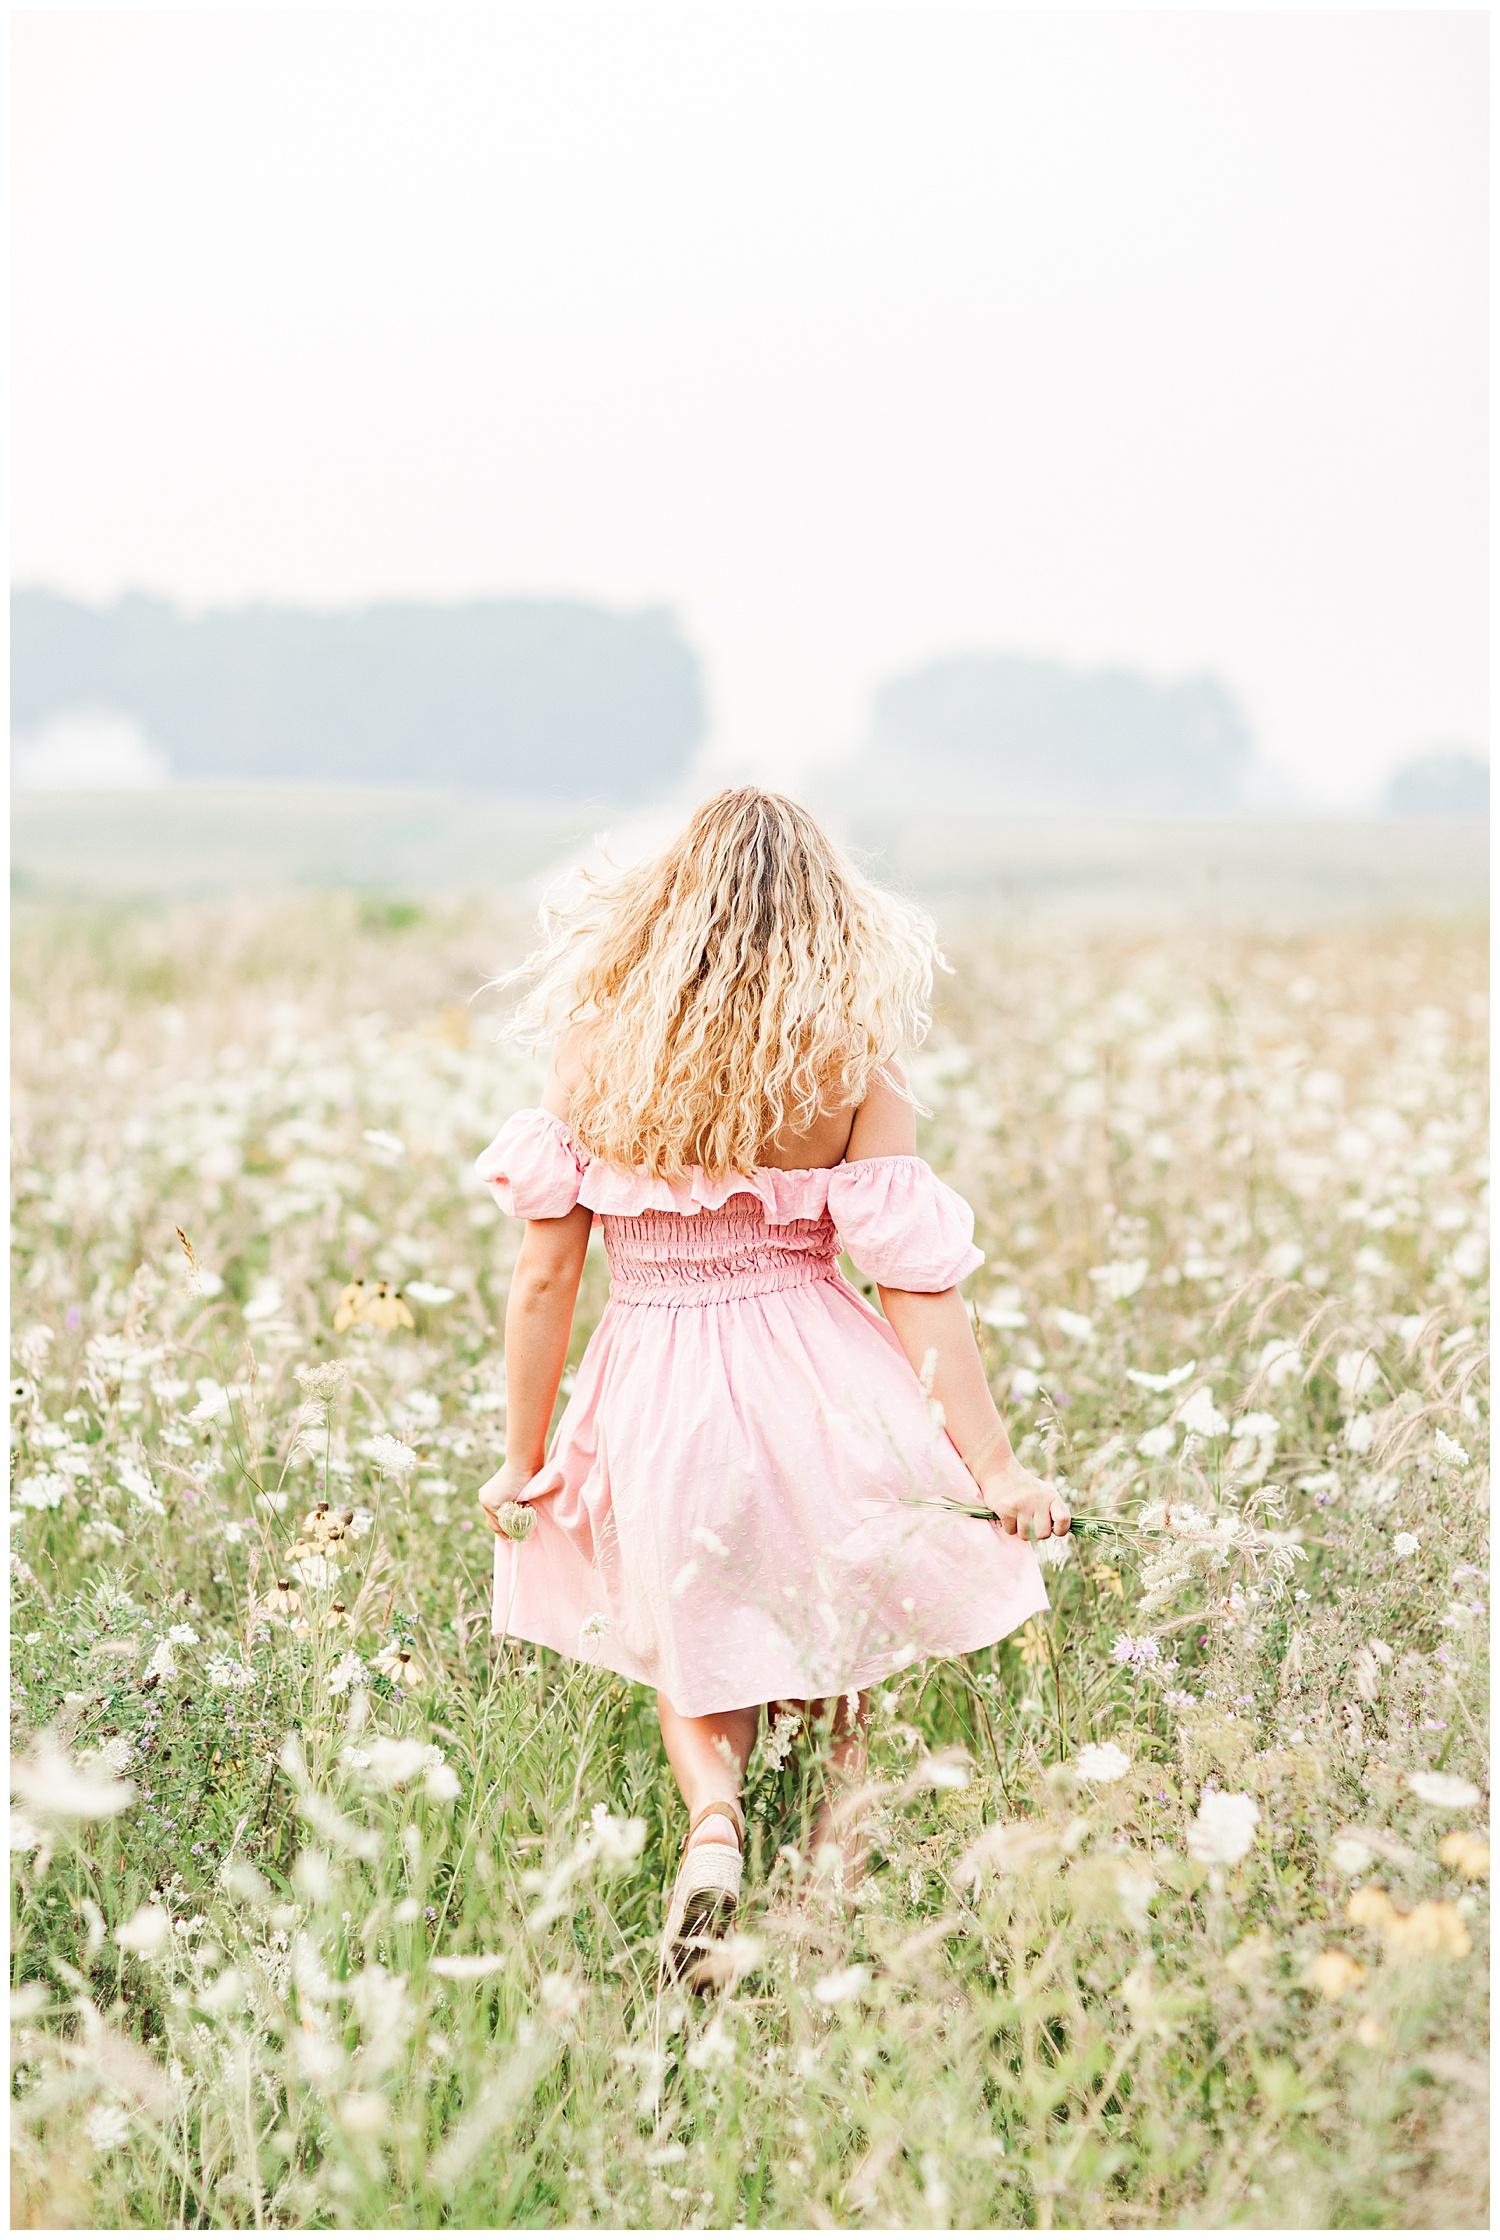 Senior Rachel wearing a light pink off the shoulder dress runs away in a wildflower field | CB Studio